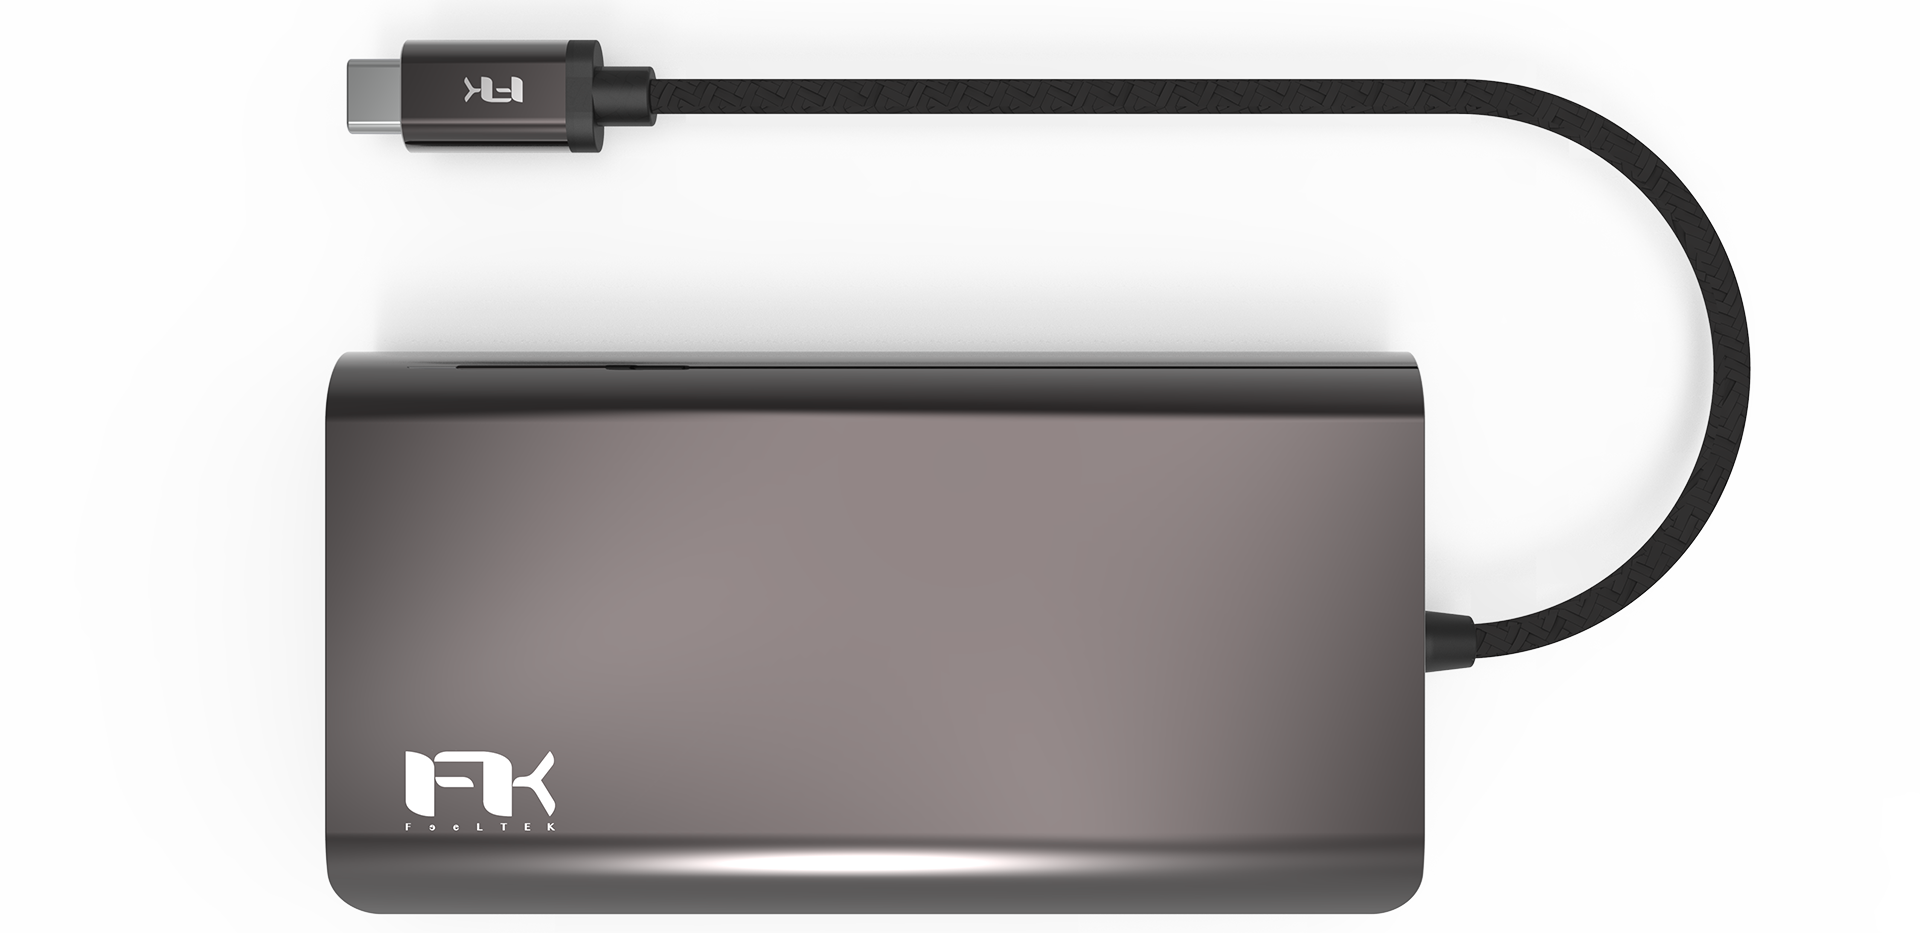 Protable 8 in 1 USB-C Hub